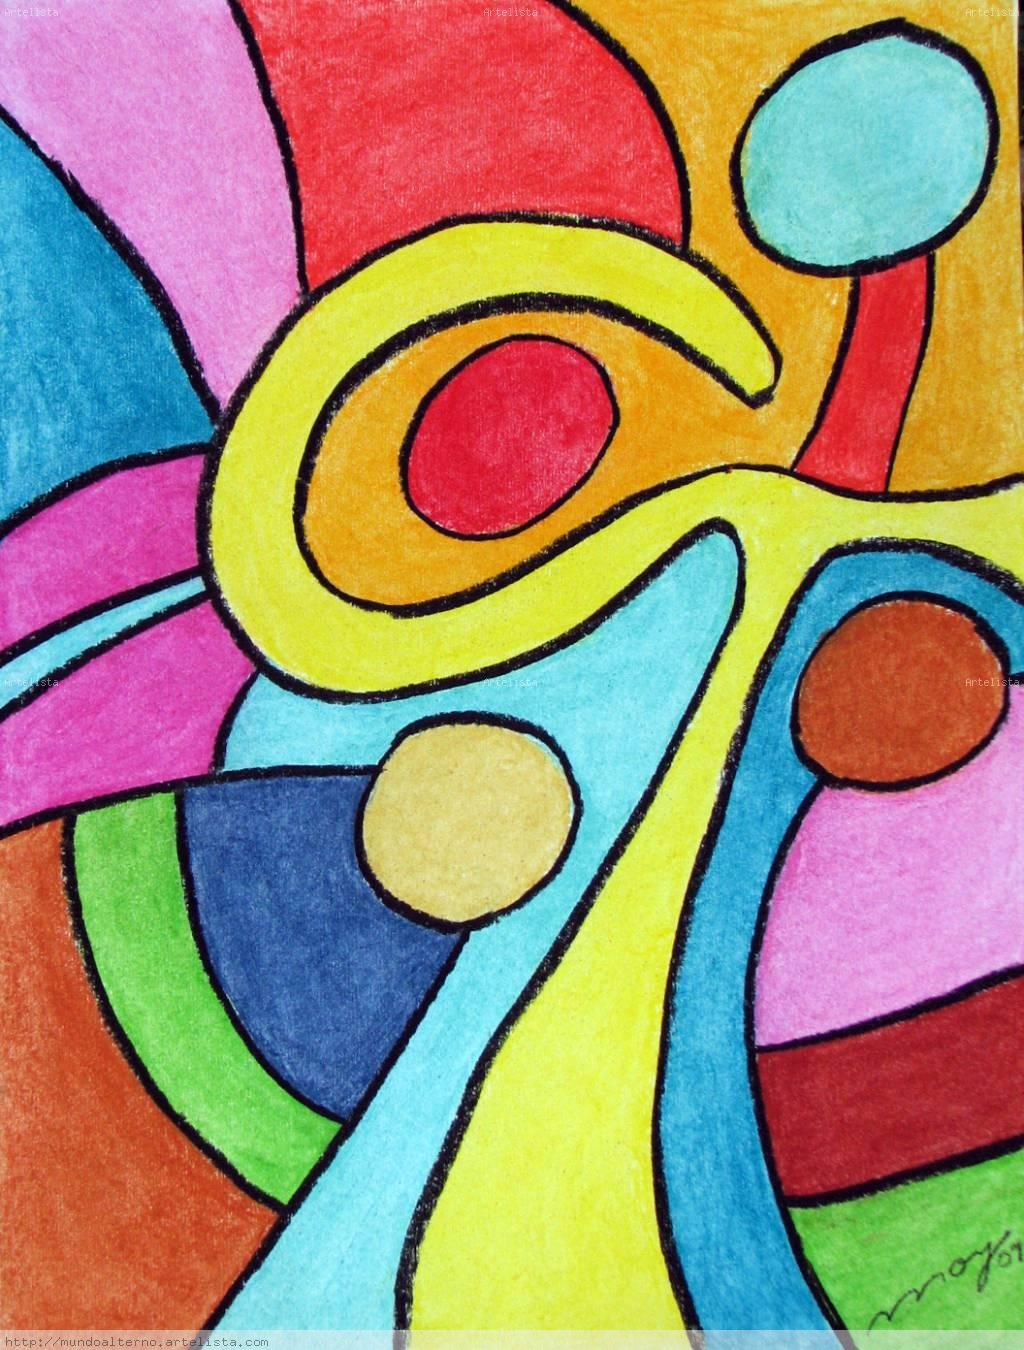 Pin de paola andrea en motivos de bolsas pinterest for Imagenes de cuadros abstractos faciles de hacer